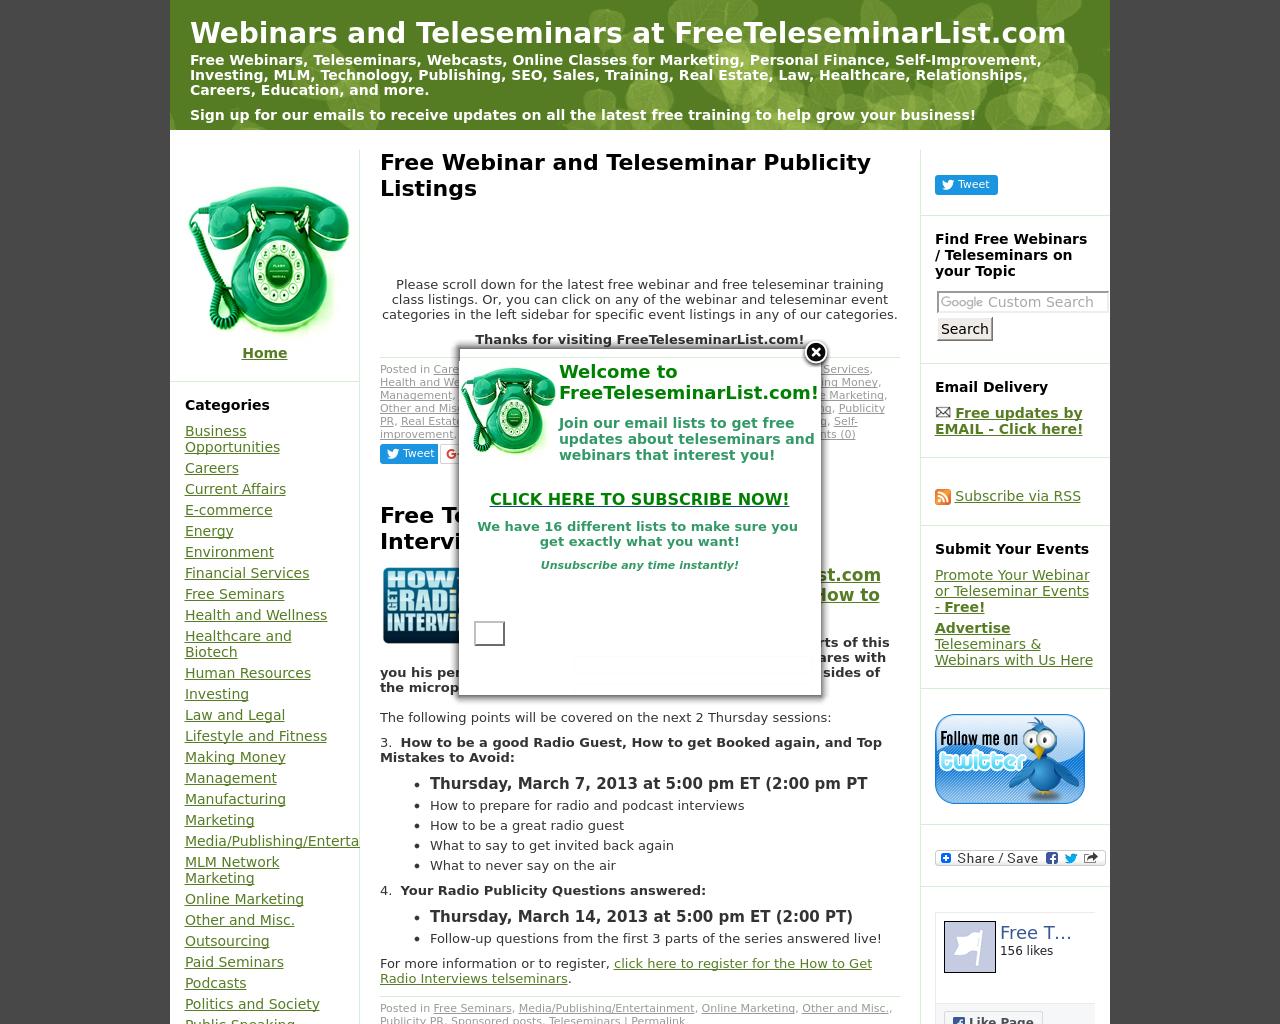 Freeteleseminarlist.com-Advertising-Reviews-Pricing